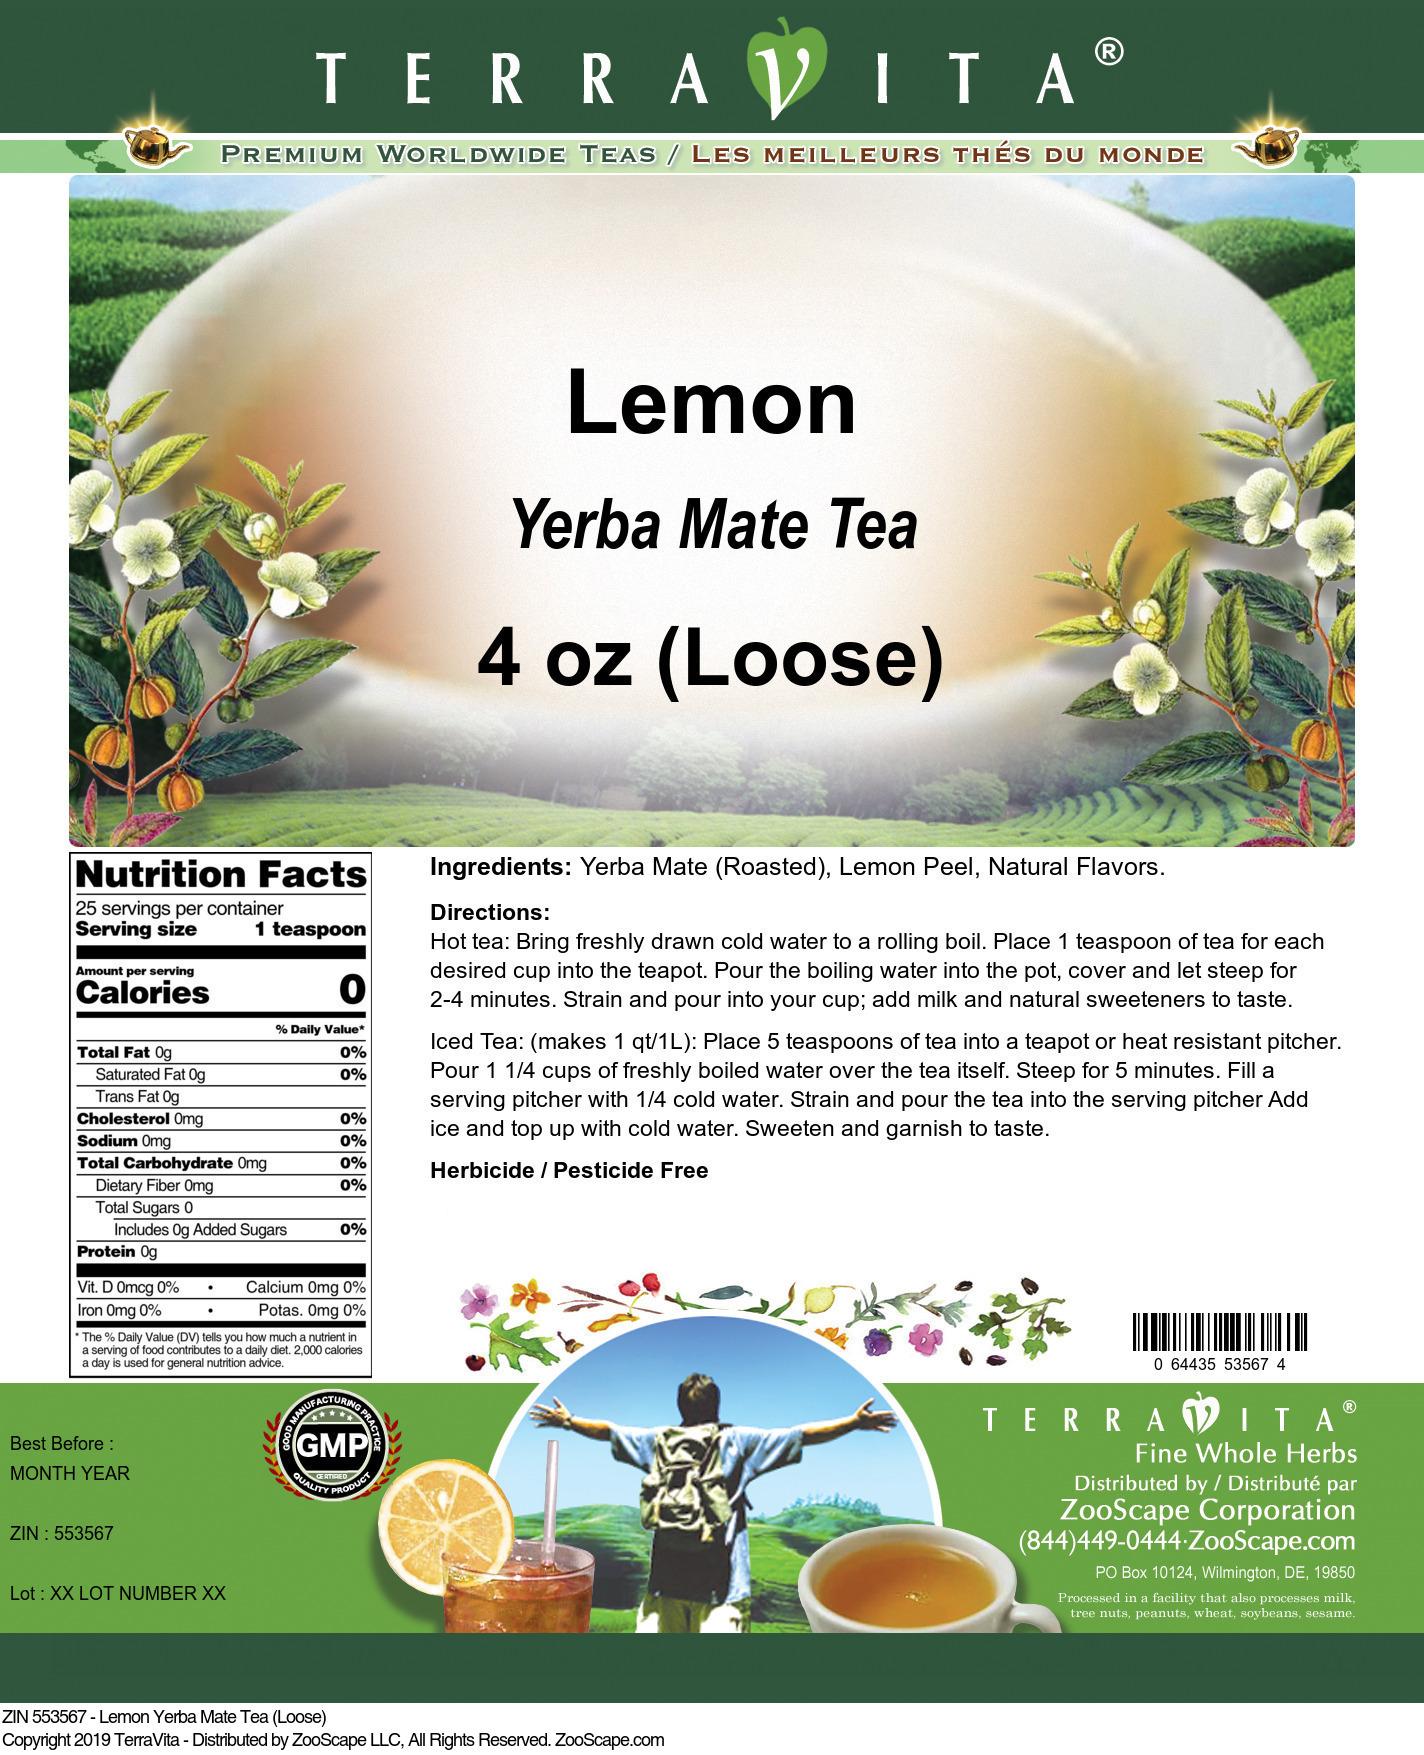 Lemon Yerba Mate Tea (Loose)